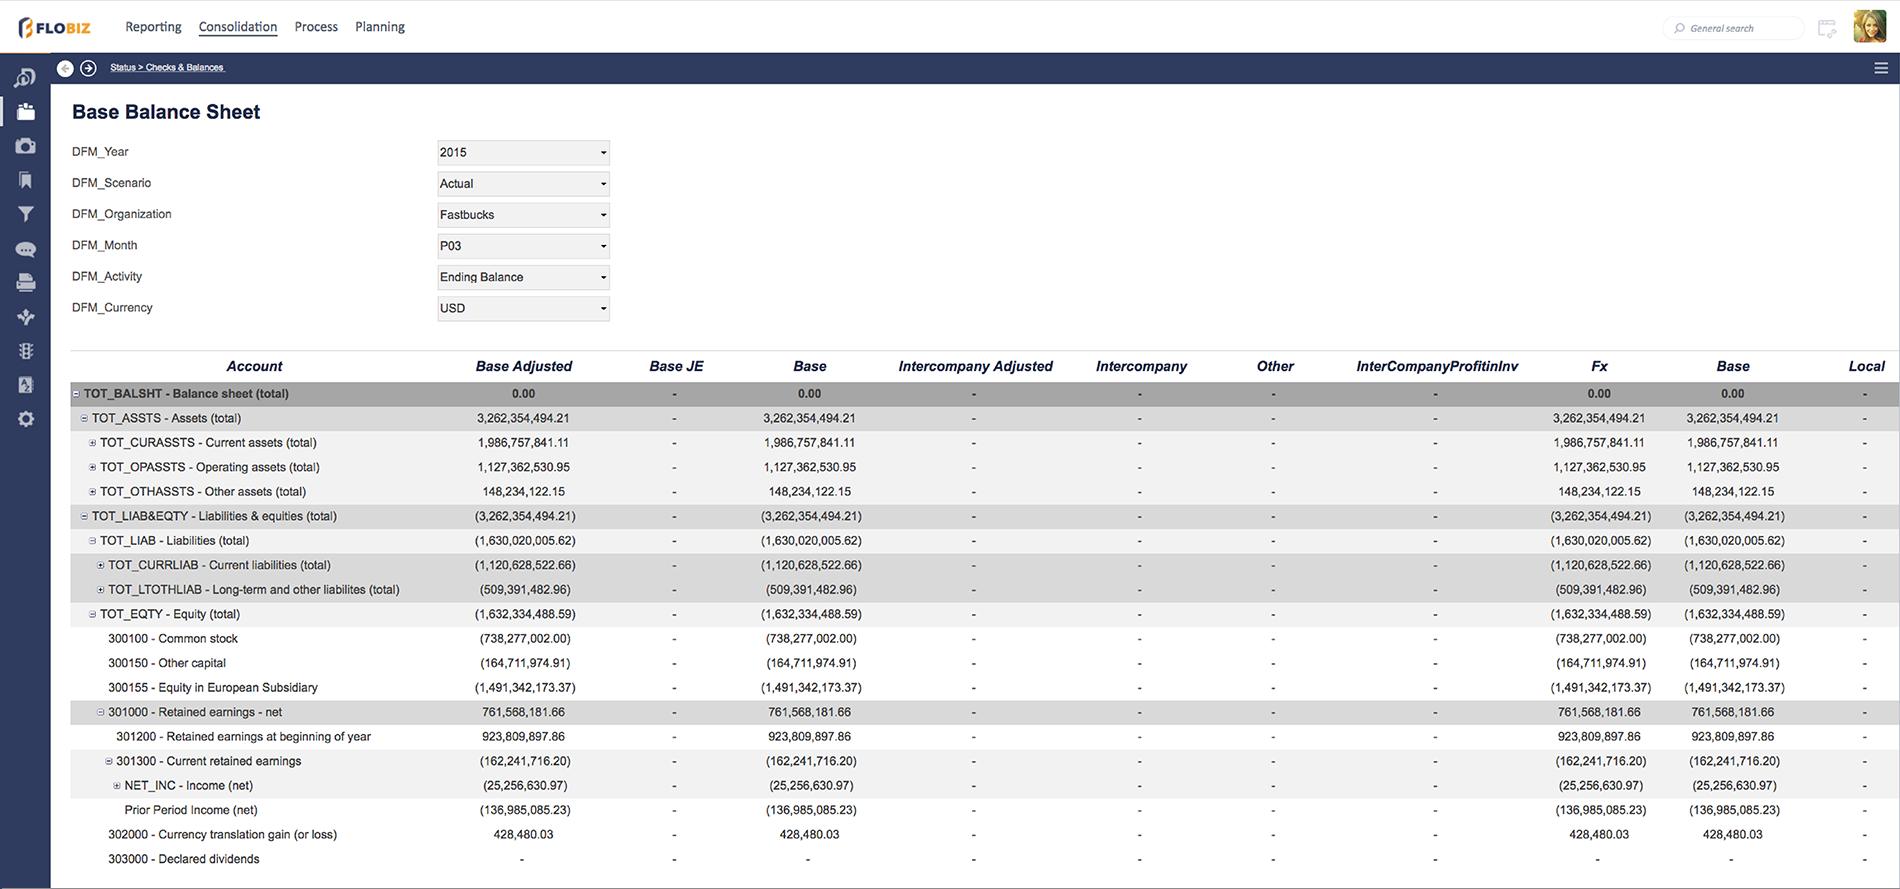 DataClarity Financial Analytics